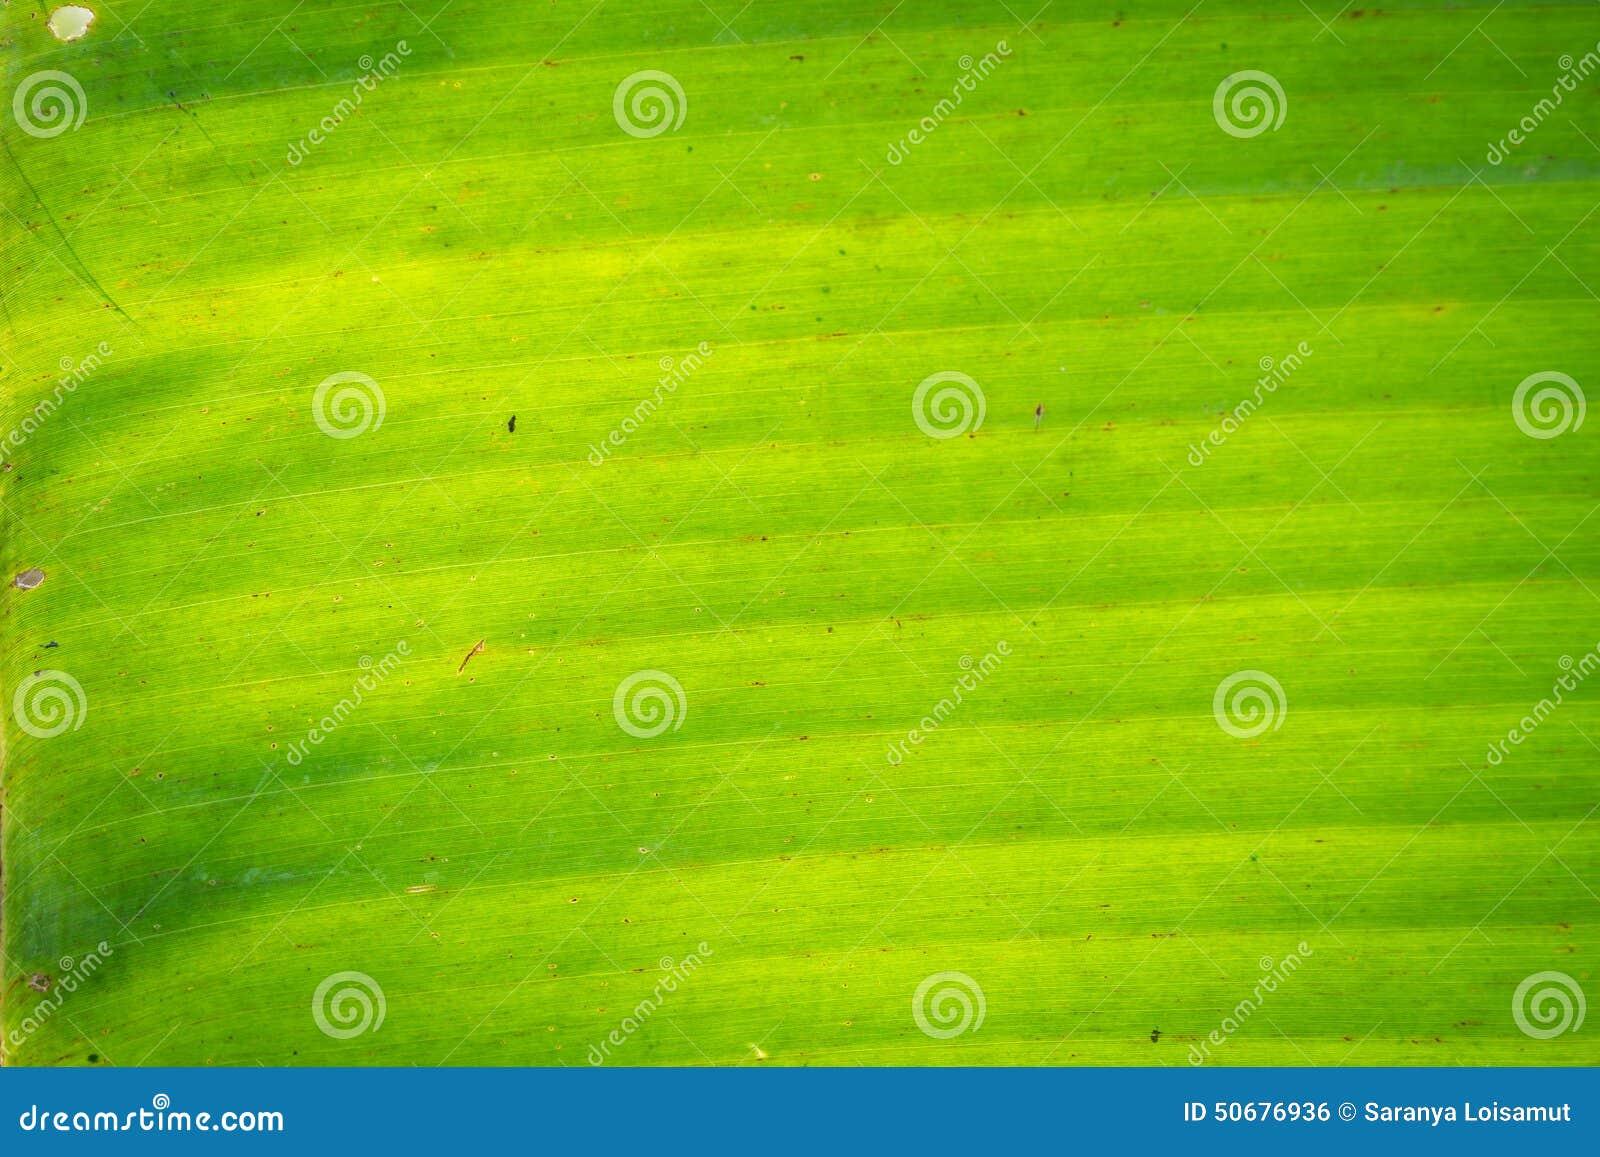 Download 香蕉叶子 库存照片. 图片 包括有 容器, 鲤鱼, 详细资料, 干燥, 计数, 香烟, 背包, beauvoir - 50676936